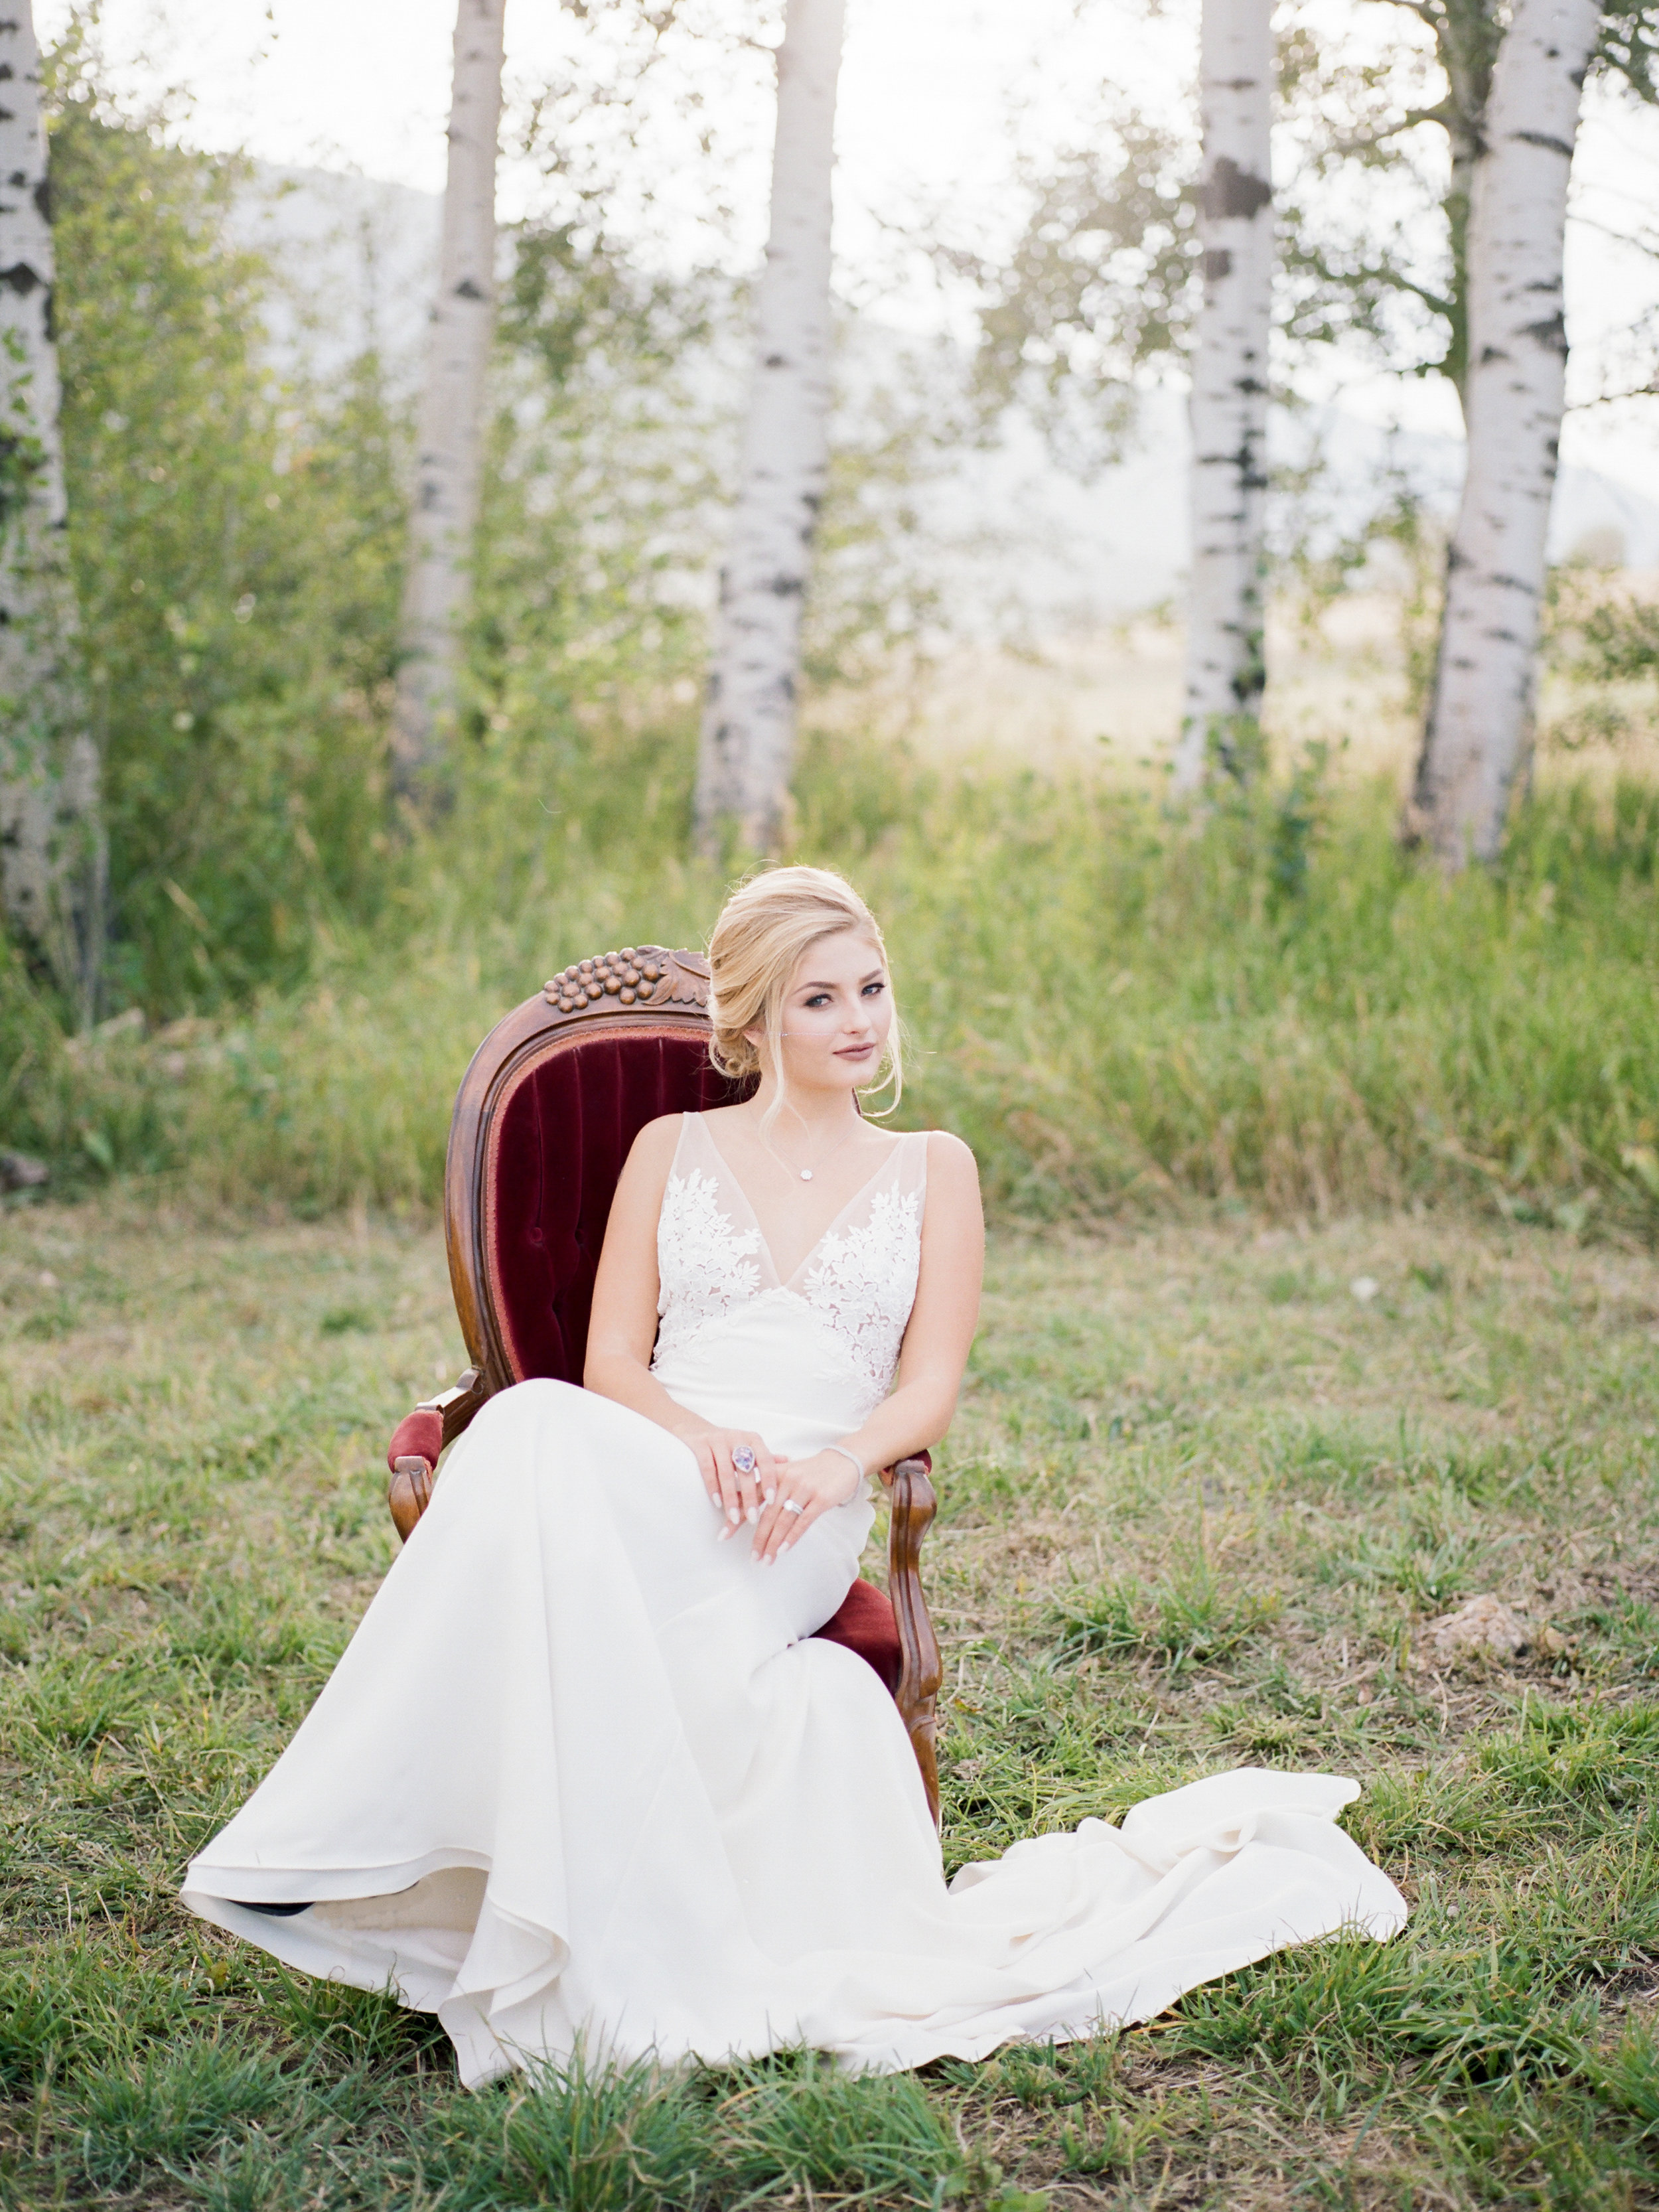 Bozeman-Big Sky-Montana-wedding-engagement-family-photographer-0153.jpg